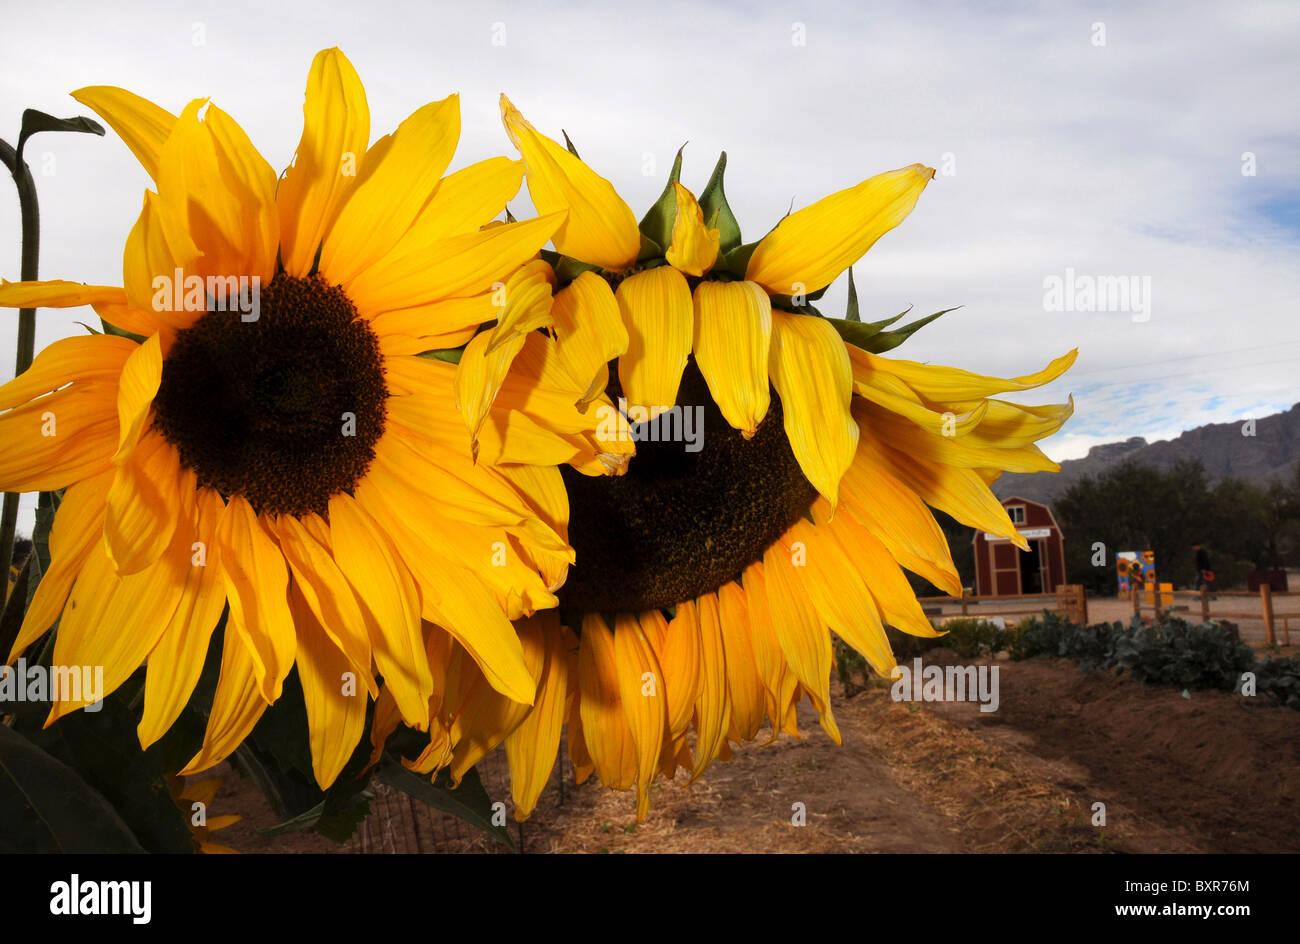 Sunflowers in Tucson, Arizona, USA. - Stock Image